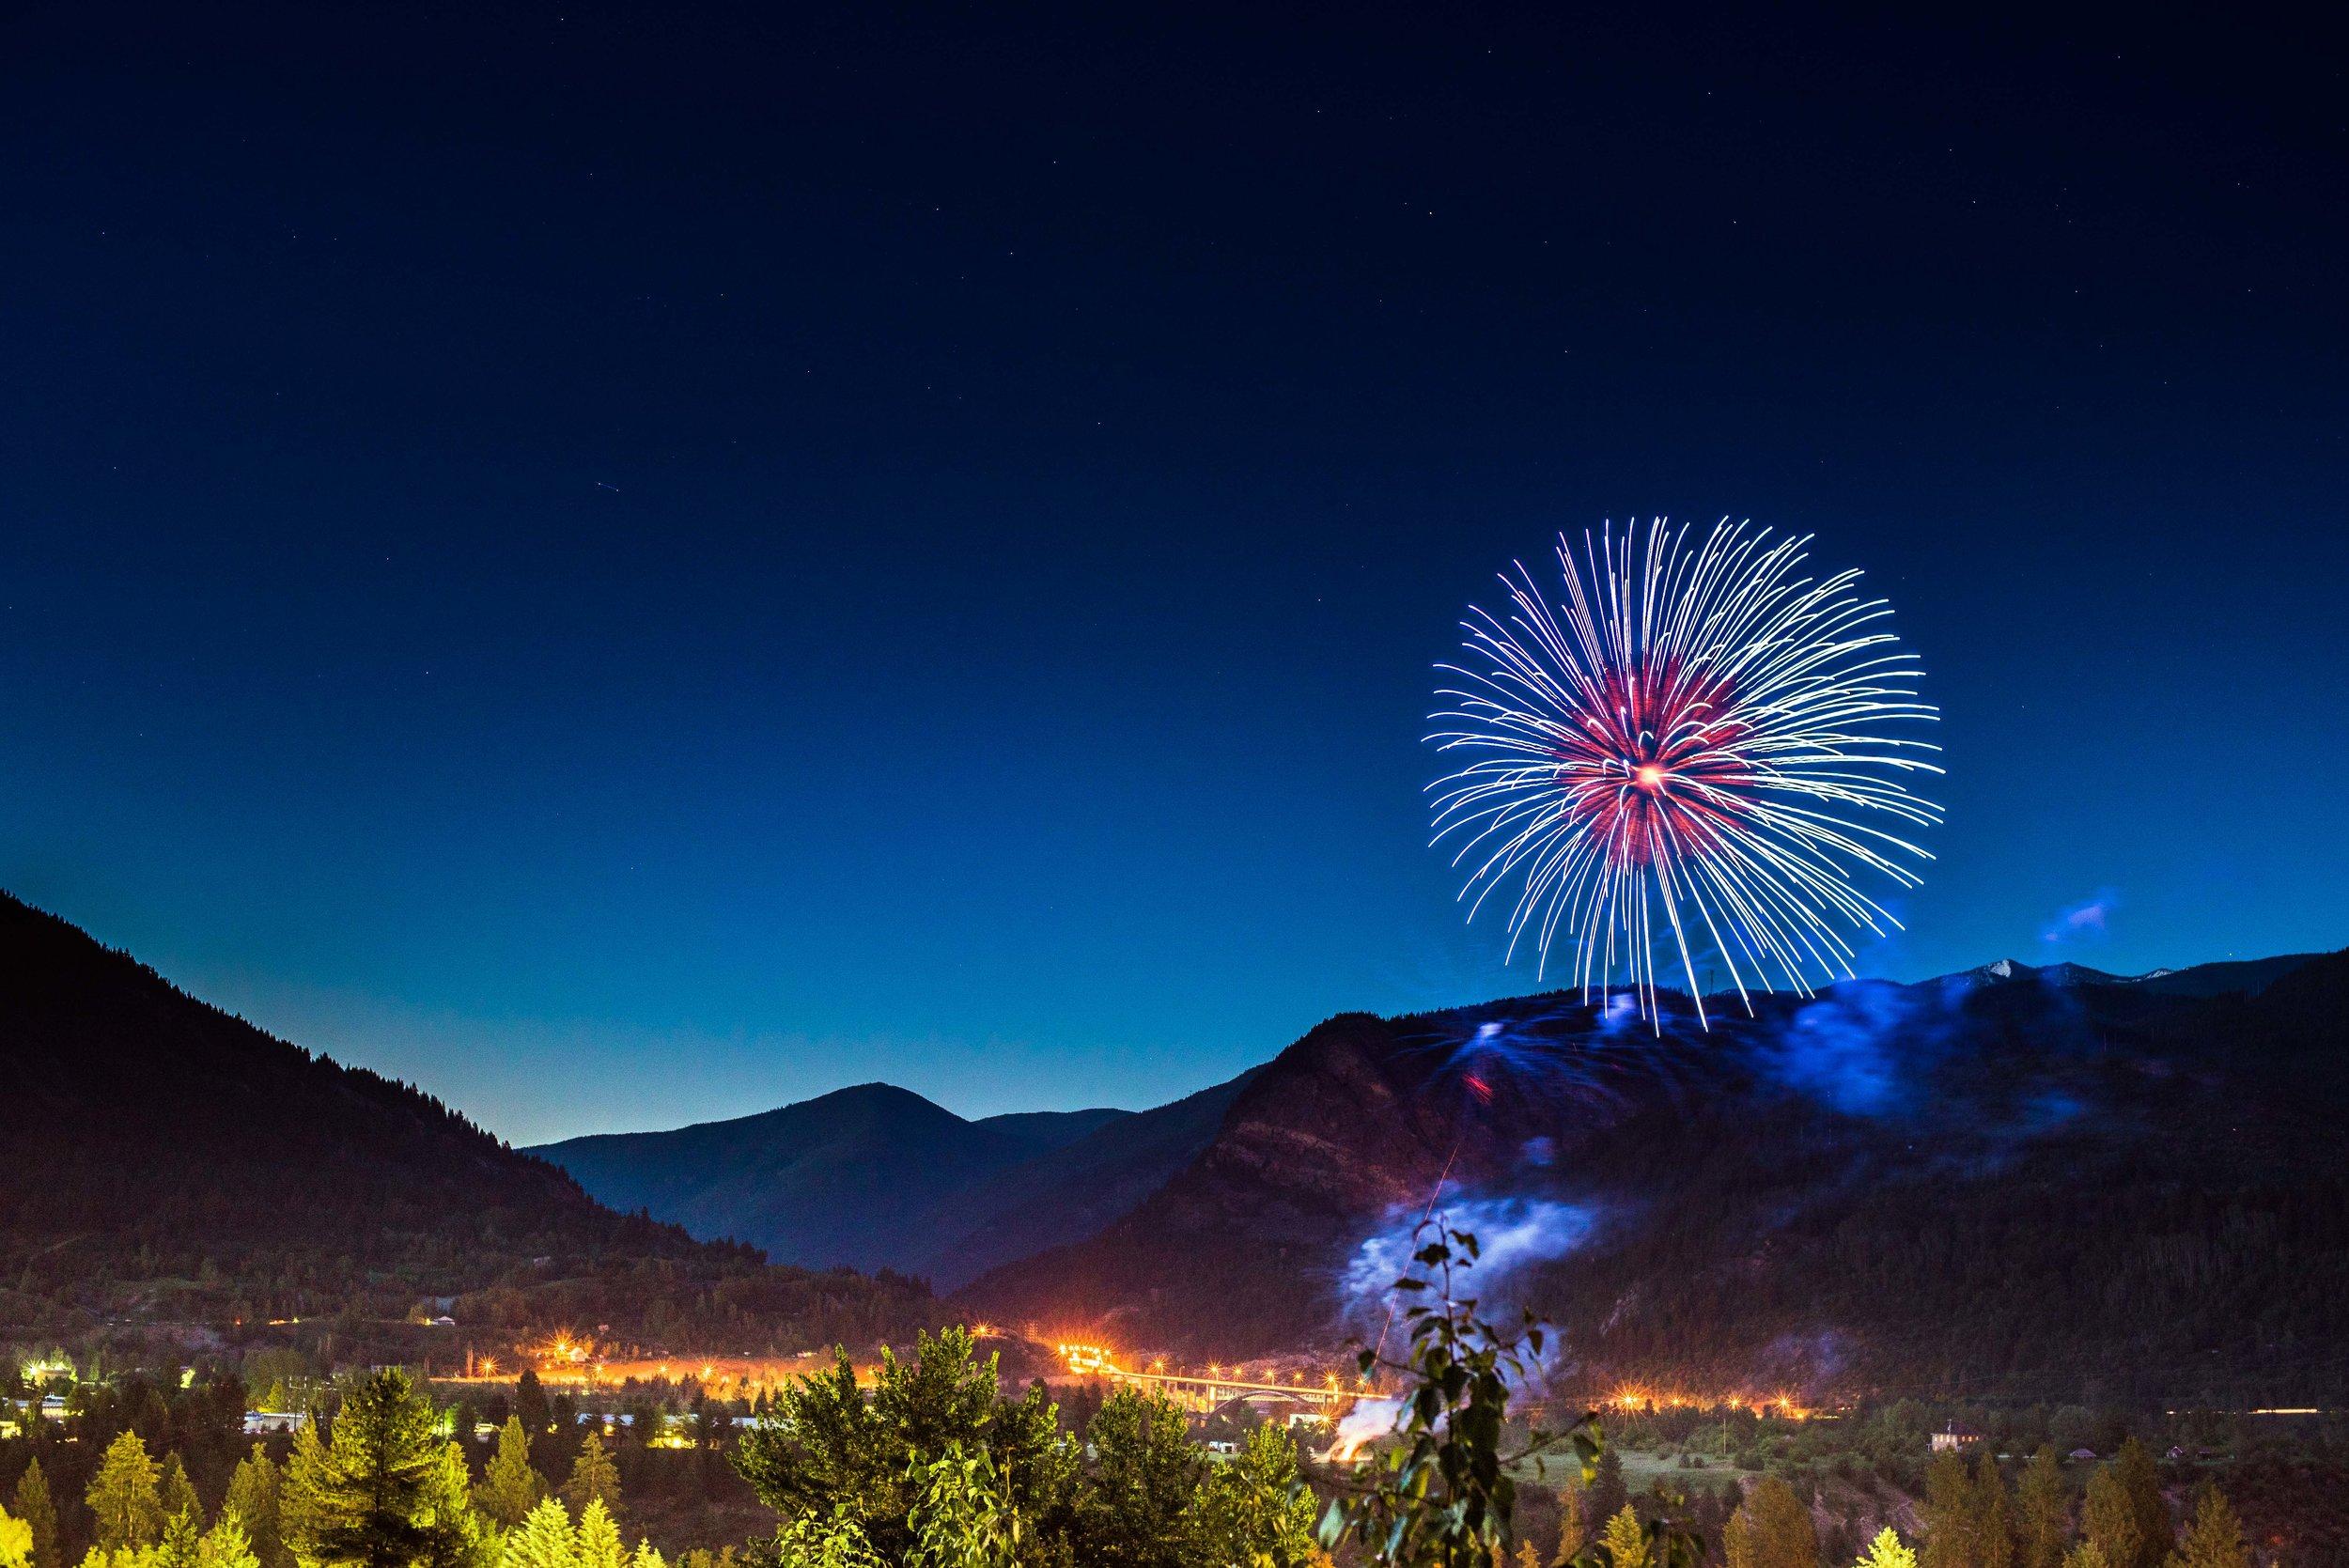 Fireworks at Castlegar Sunfest